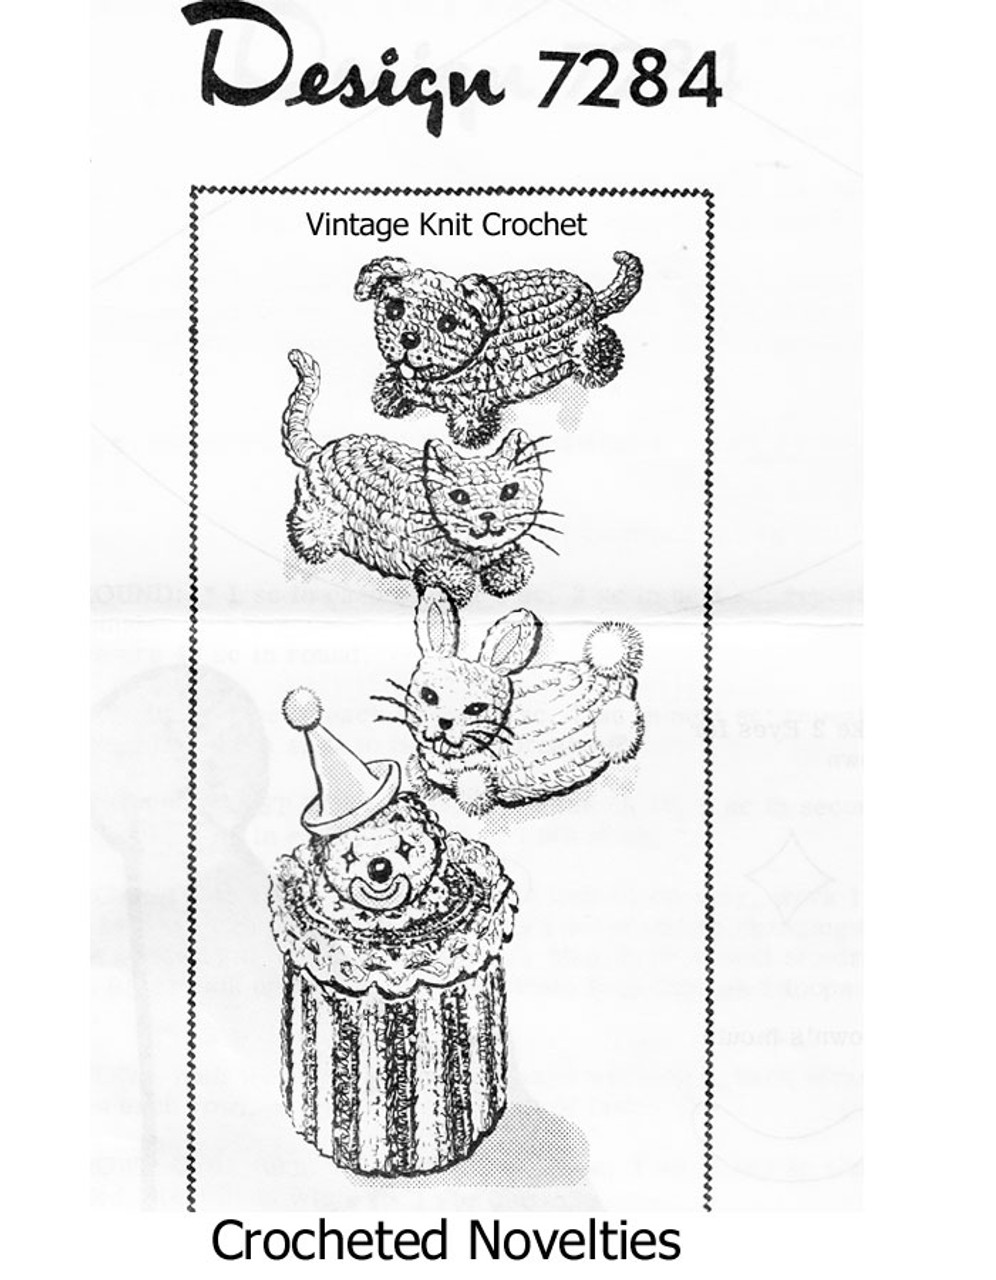 Crochet Clown Toilet Paper Cover Design 7284